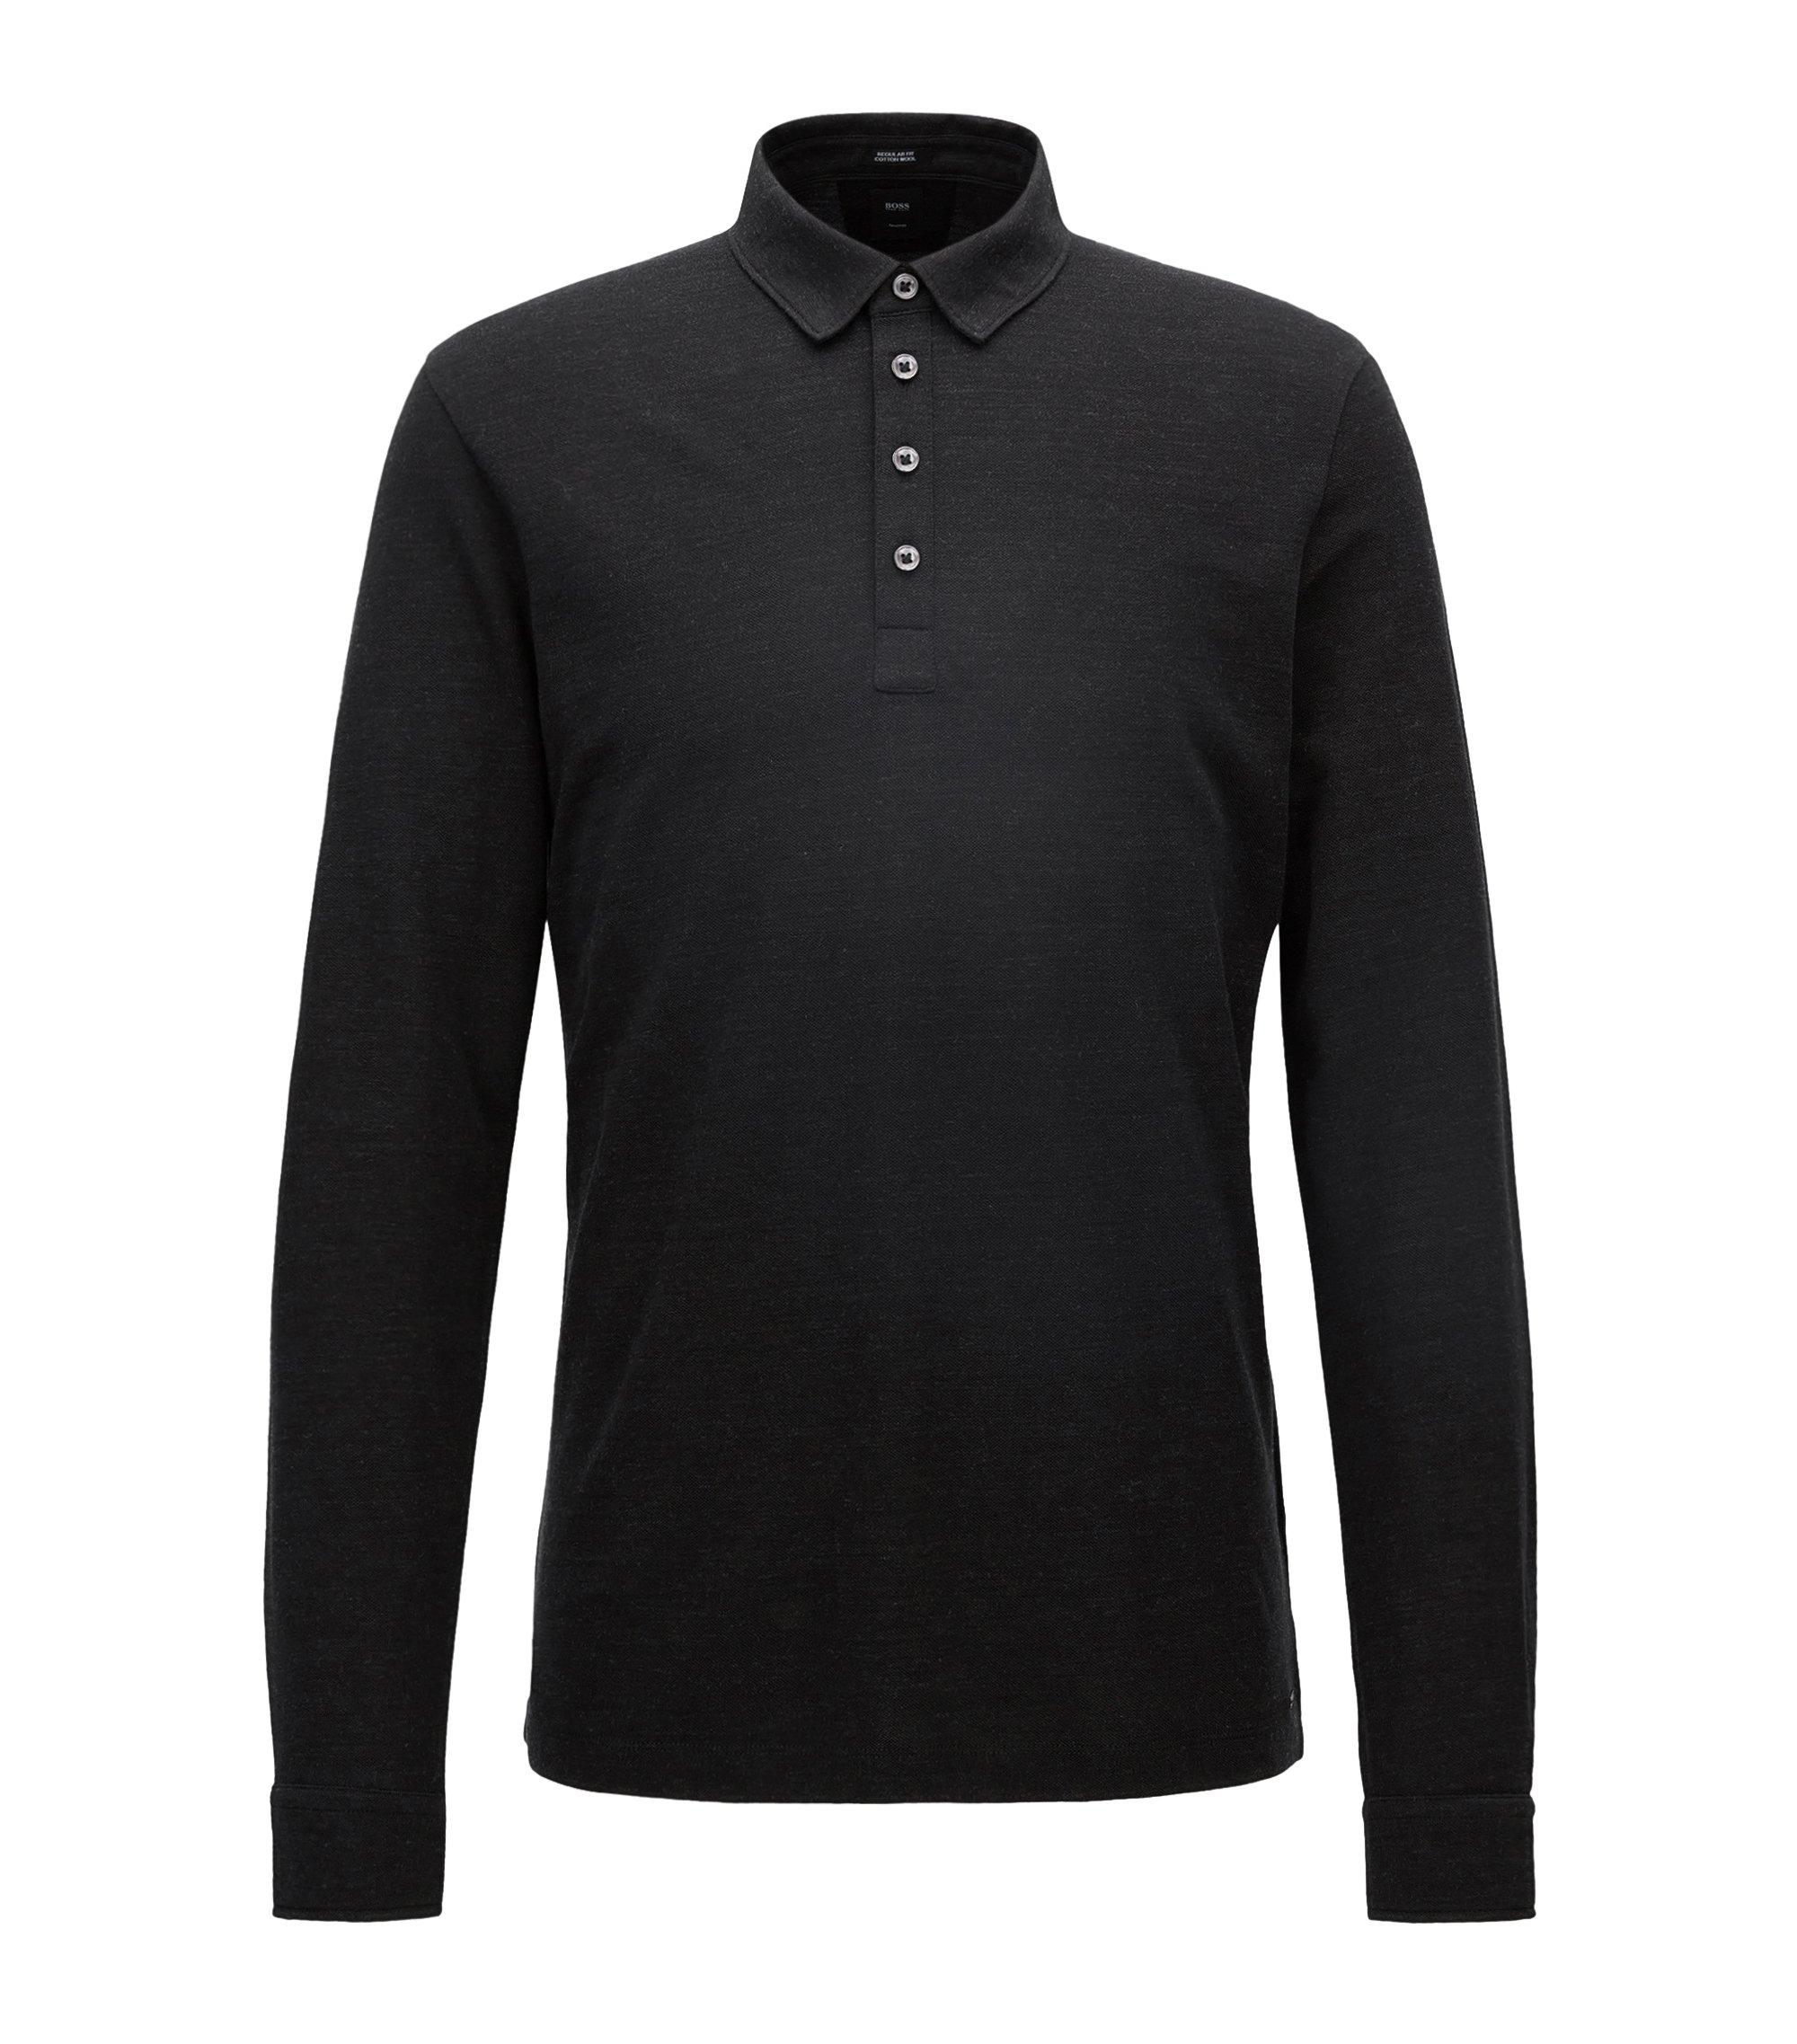 Regular-Fit Longsleeve Poloshirt aus Baumwoll-Mix mit Schurwolle, Schwarz